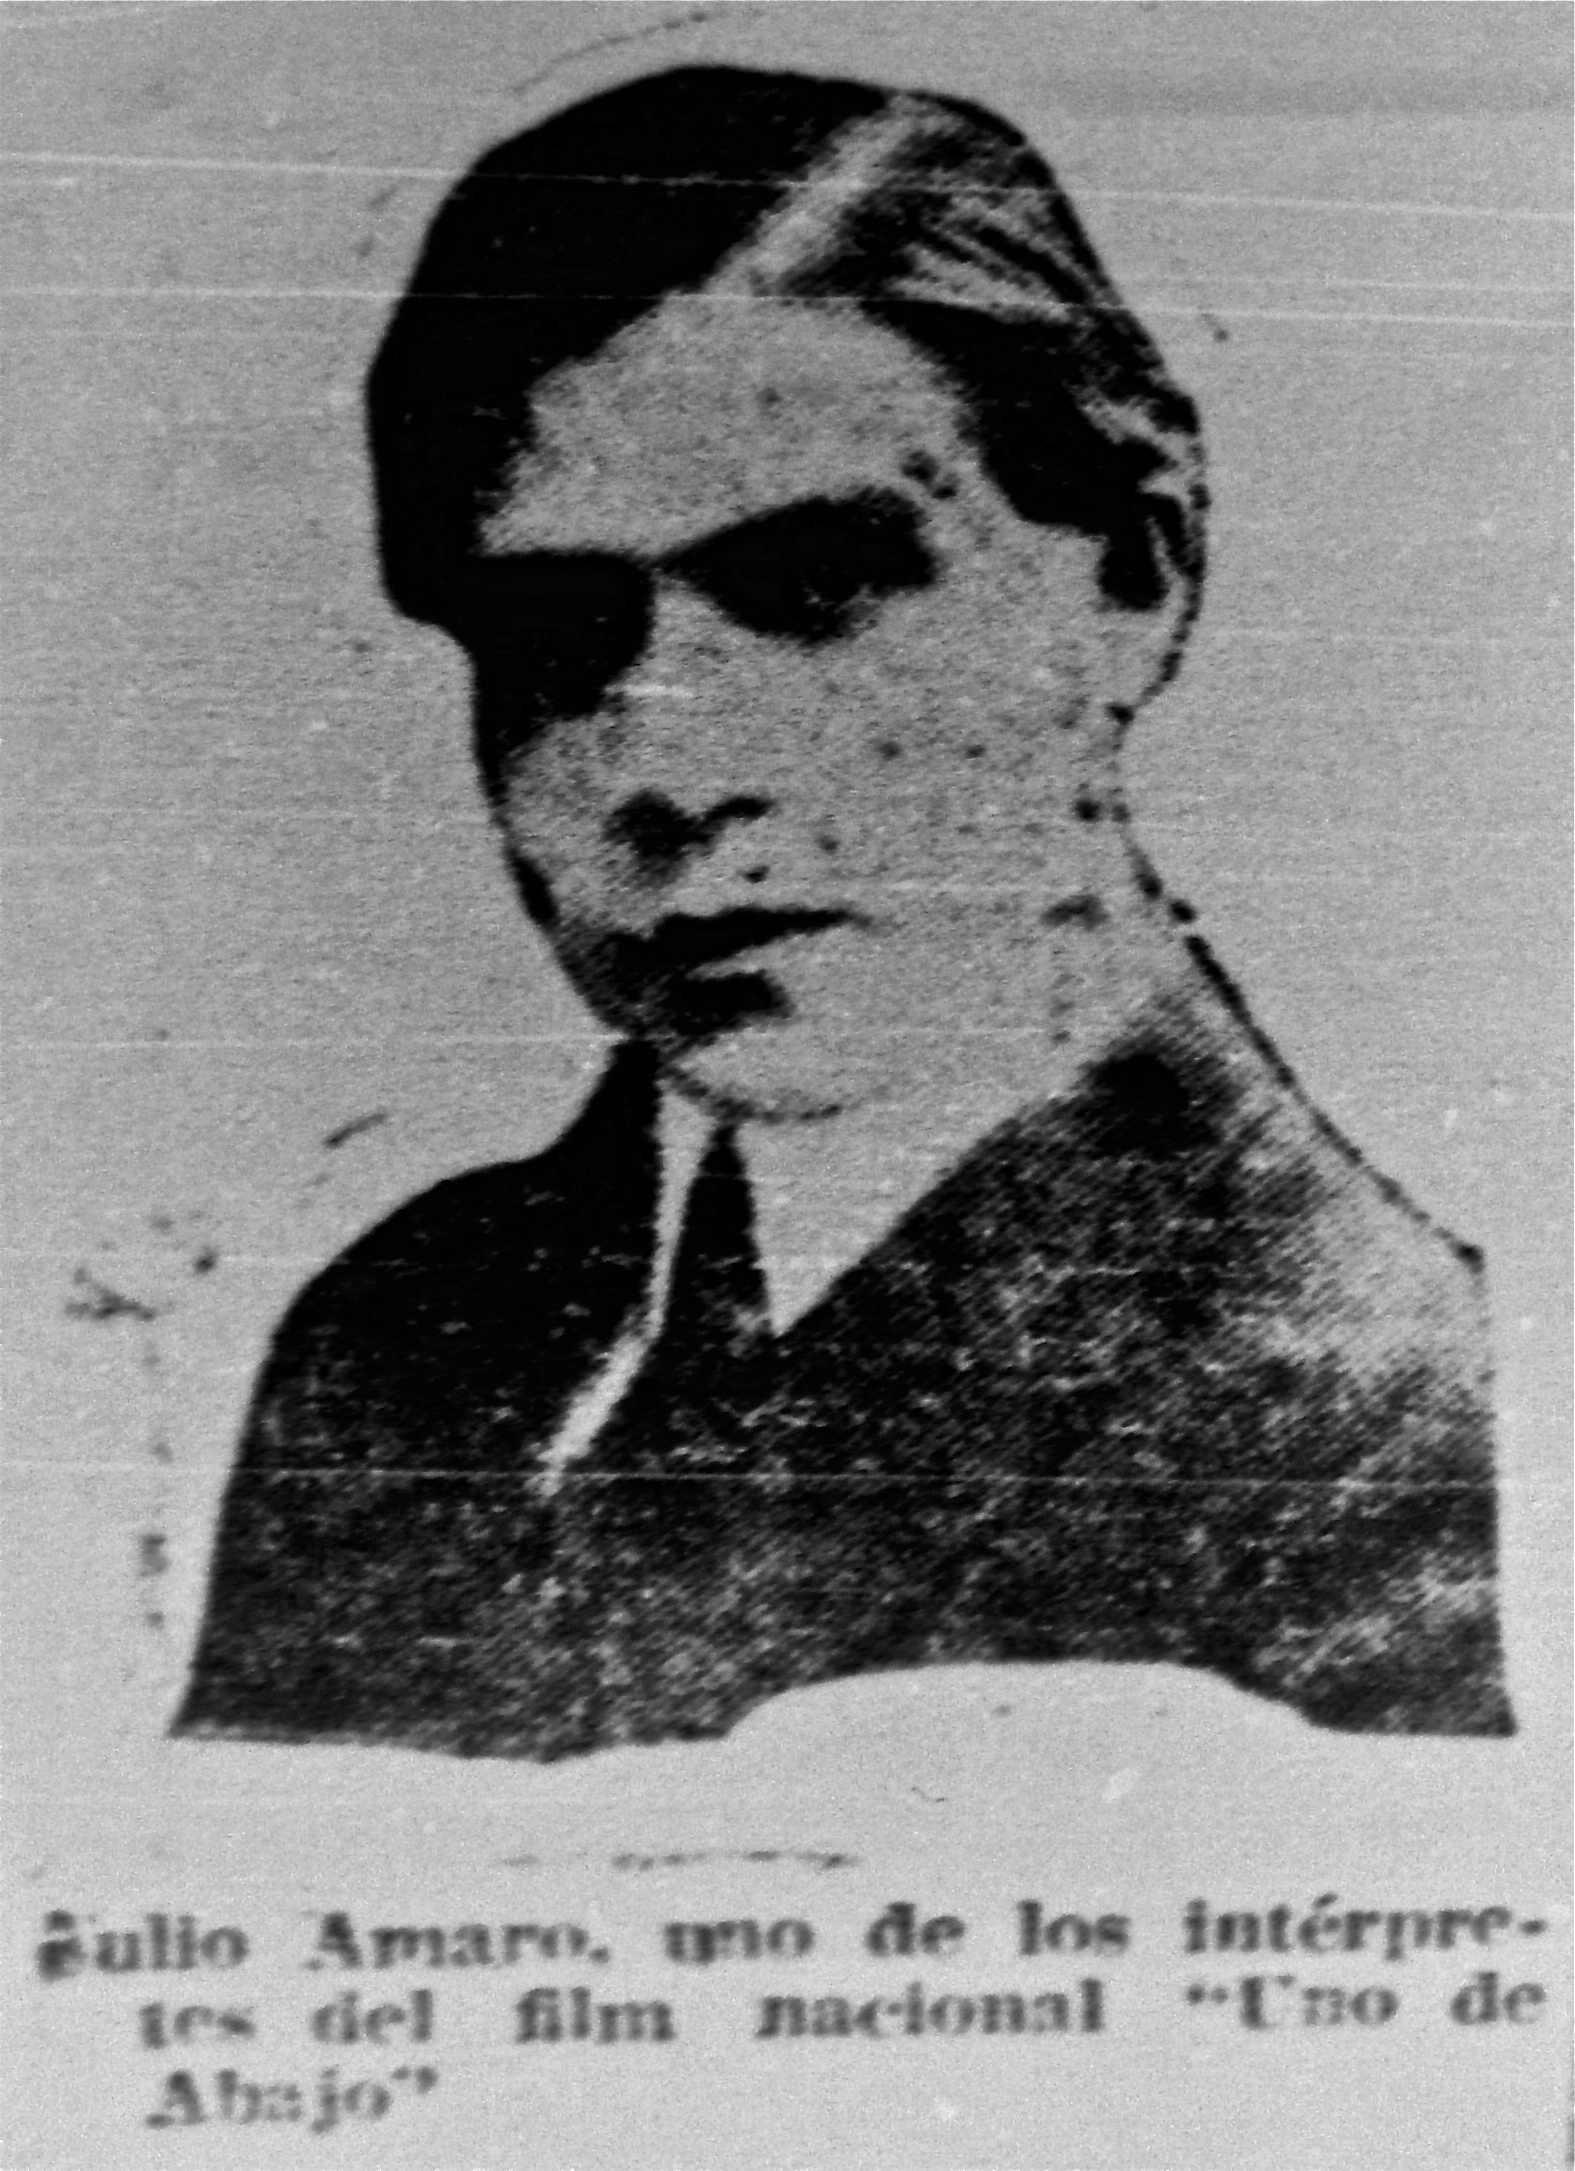 1920-10-25_LUNStgo; HoyPresentaAlhambra_UnodeAbajo (5foto_amaro)_29032013.JPG